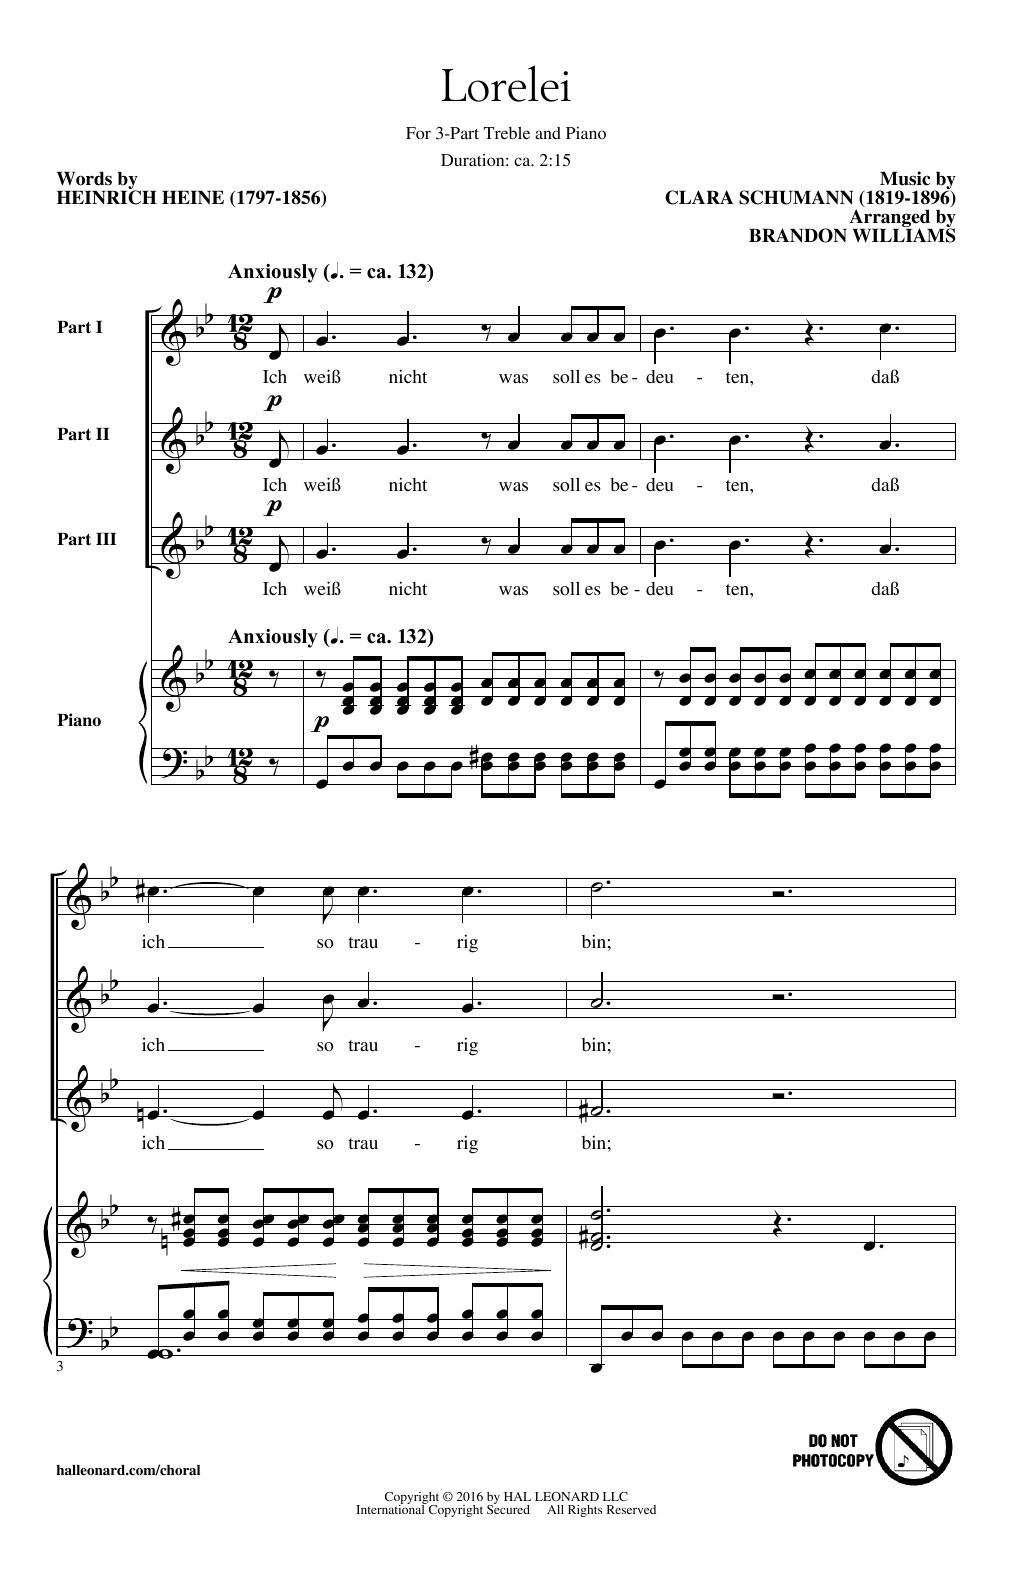 Download Brandon Williams 'Lorelei' Digital Sheet Music Notes & Chords and start playing in minutes